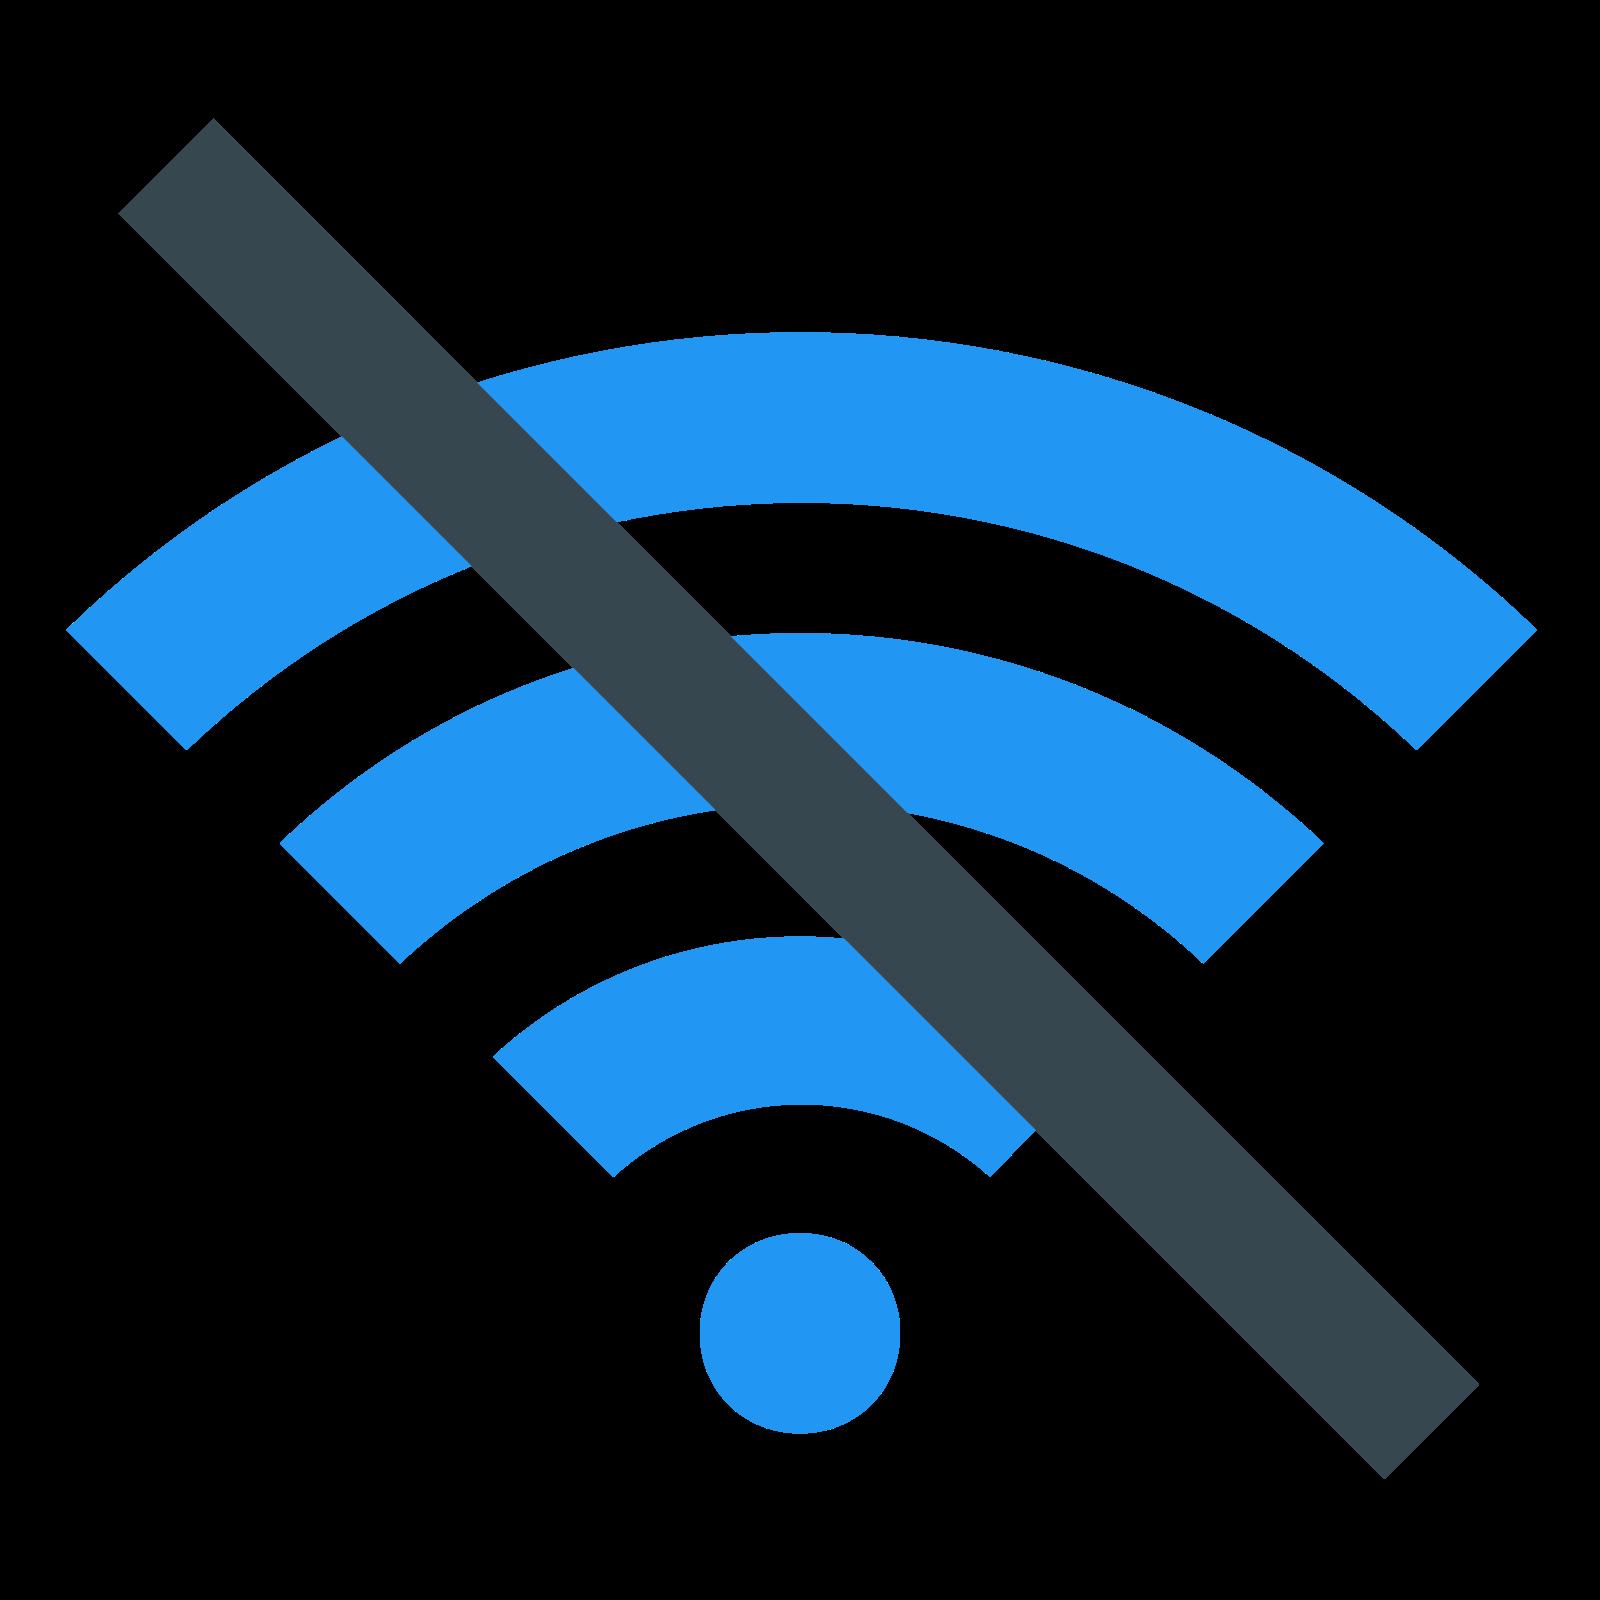 Wi-Fi off icon